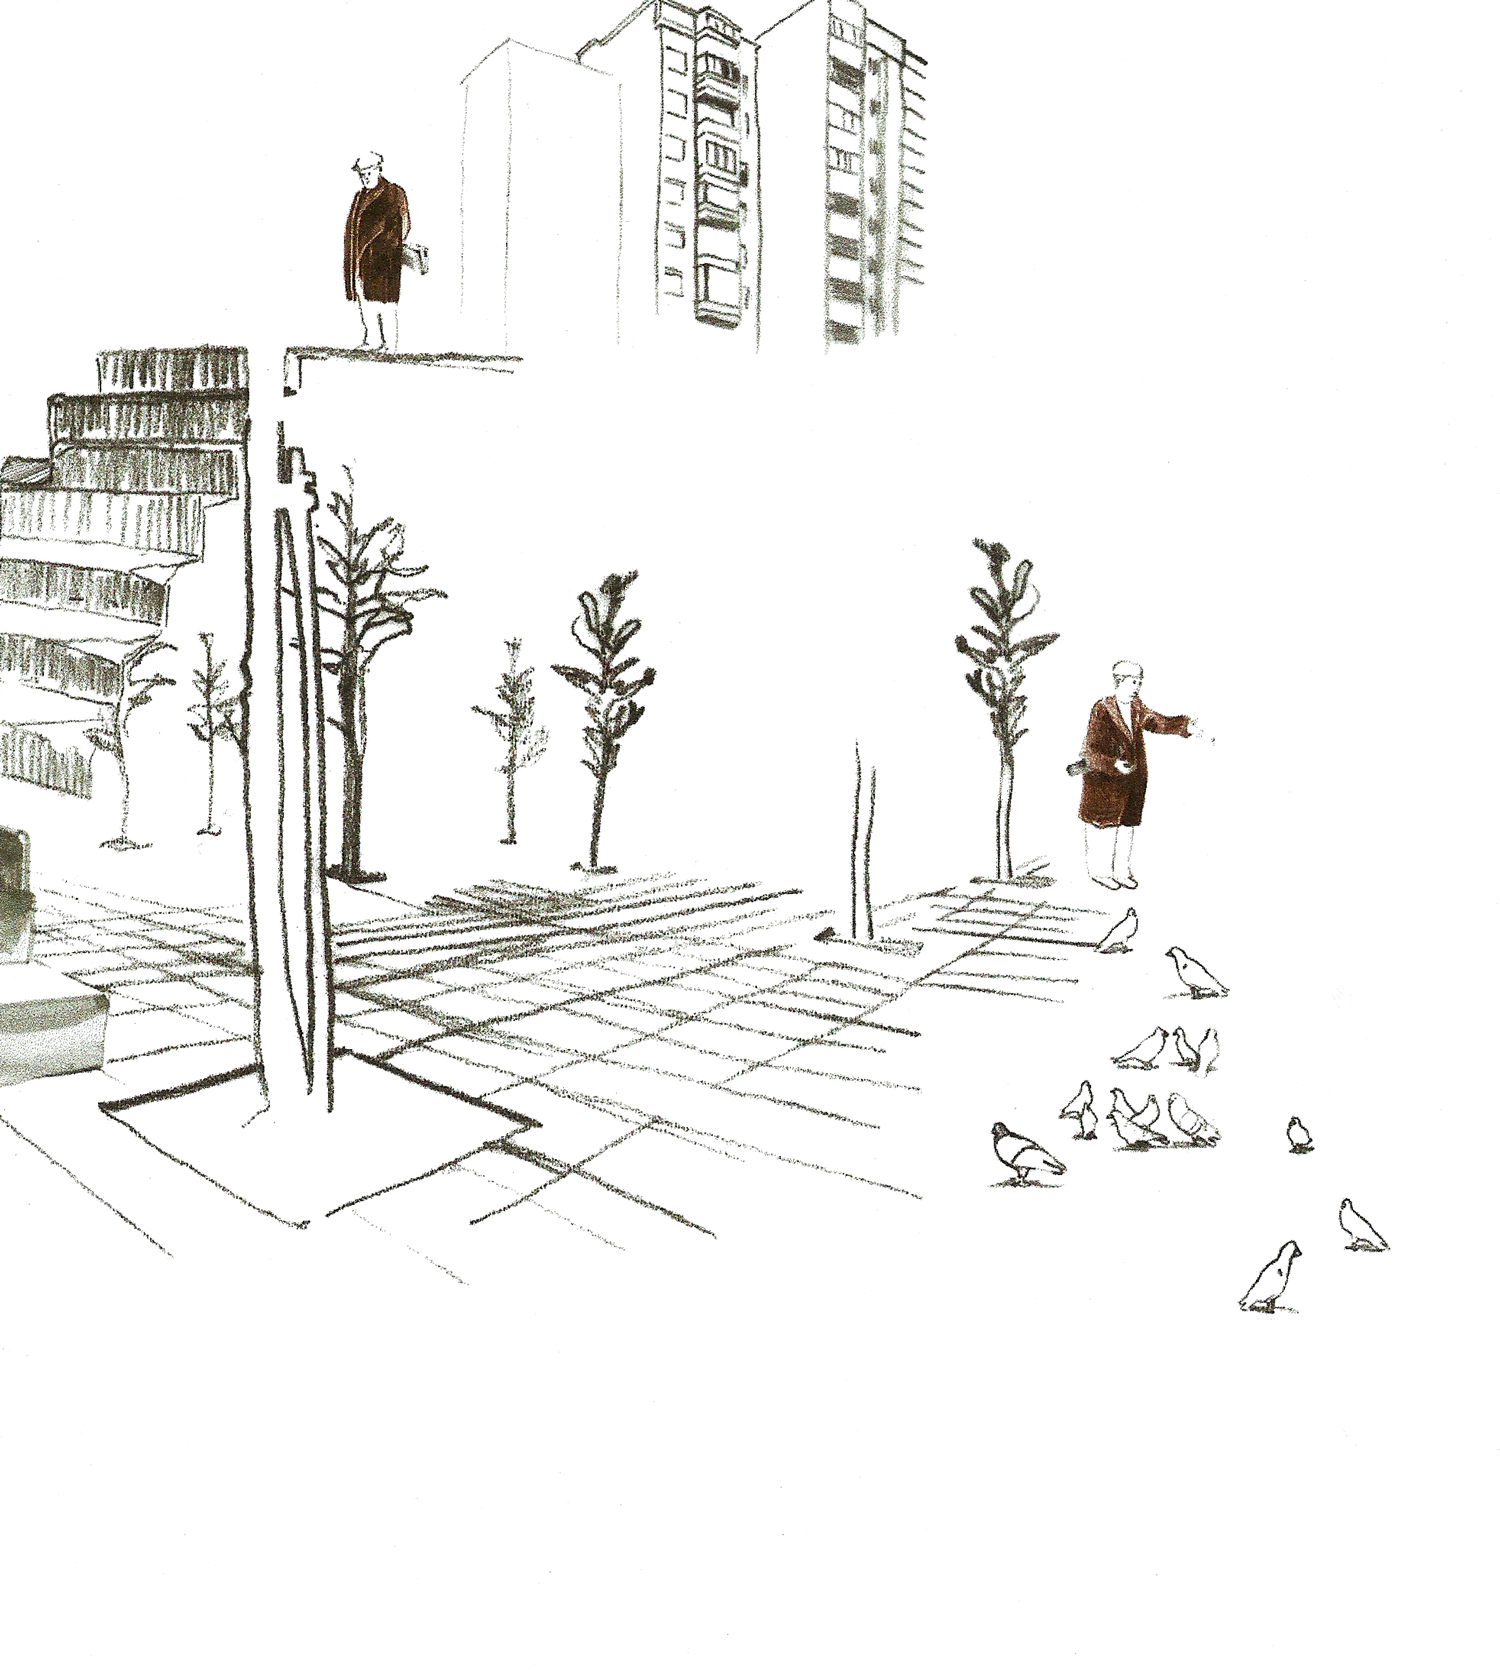 Illustration from 'Zo vanzelf'.